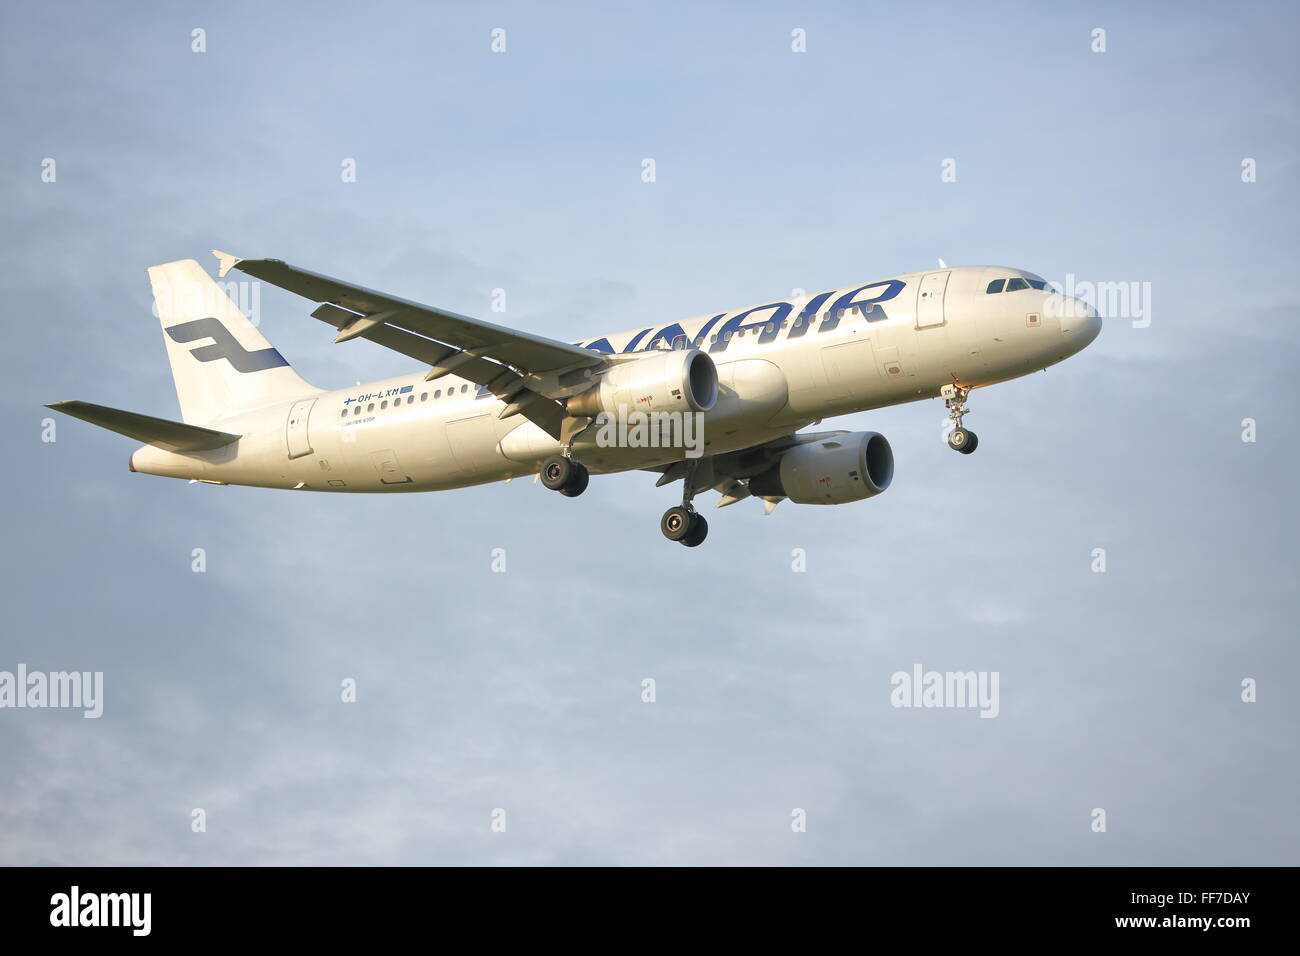 Finnair Airbus A320-200 OH-LXM landing at Heathrow Airport, London - Stock Image